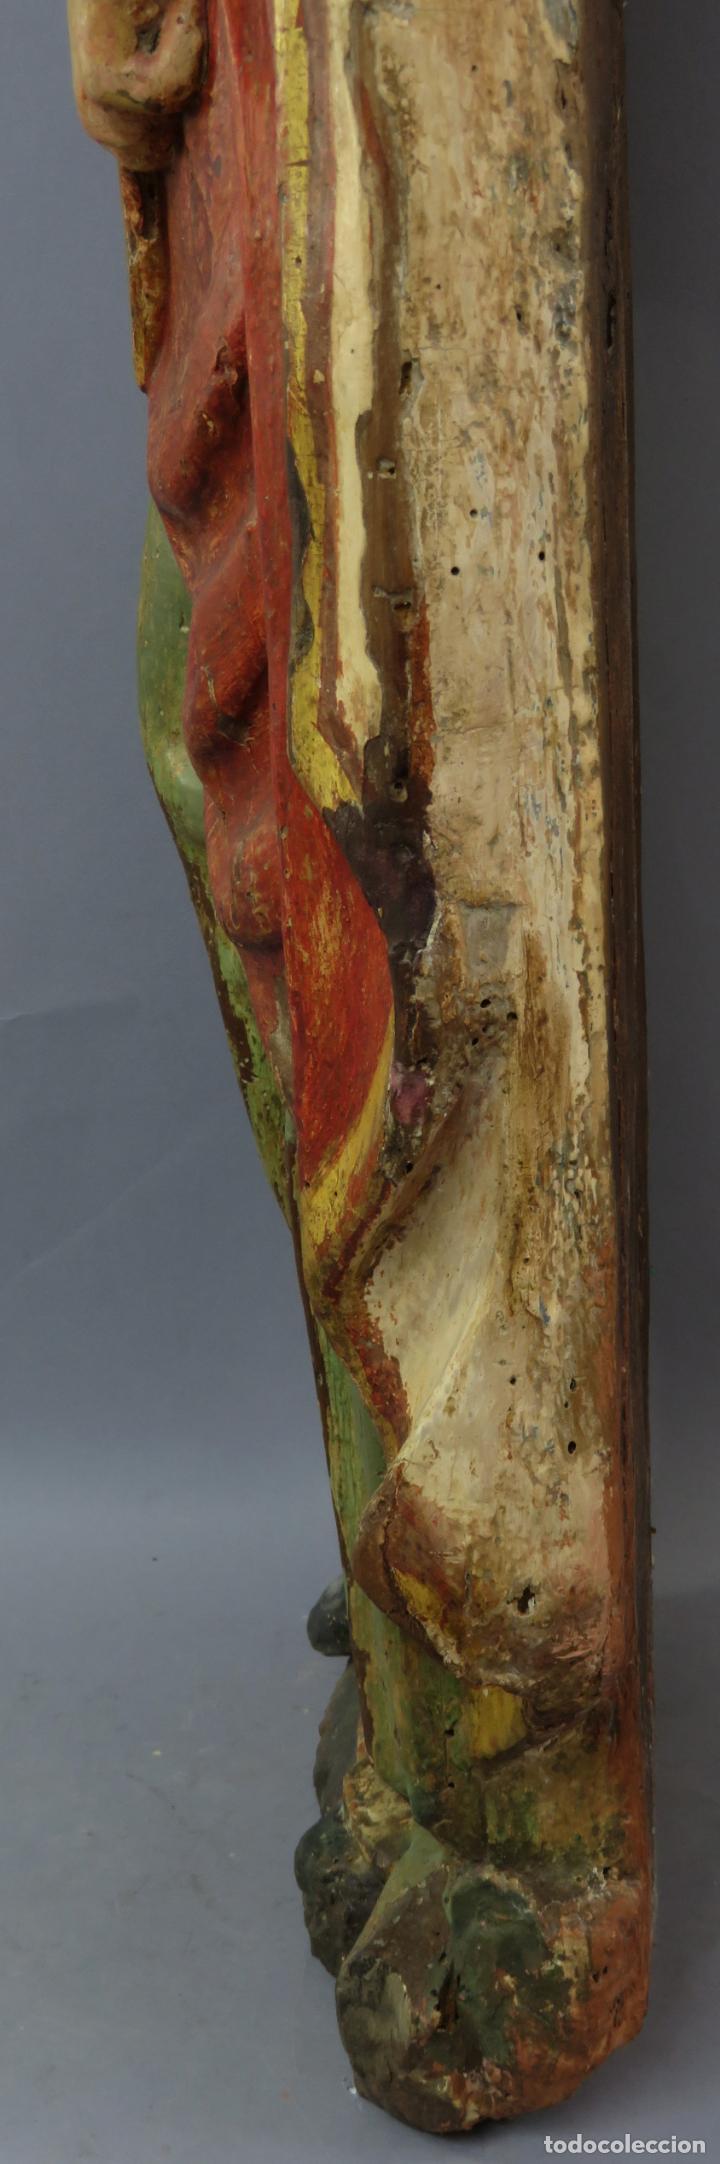 Arte: Talla de medio bulto o chuleta San Juan Evangelista madera tallada dorada y policromada XVI XVII - Foto 23 - 221922775